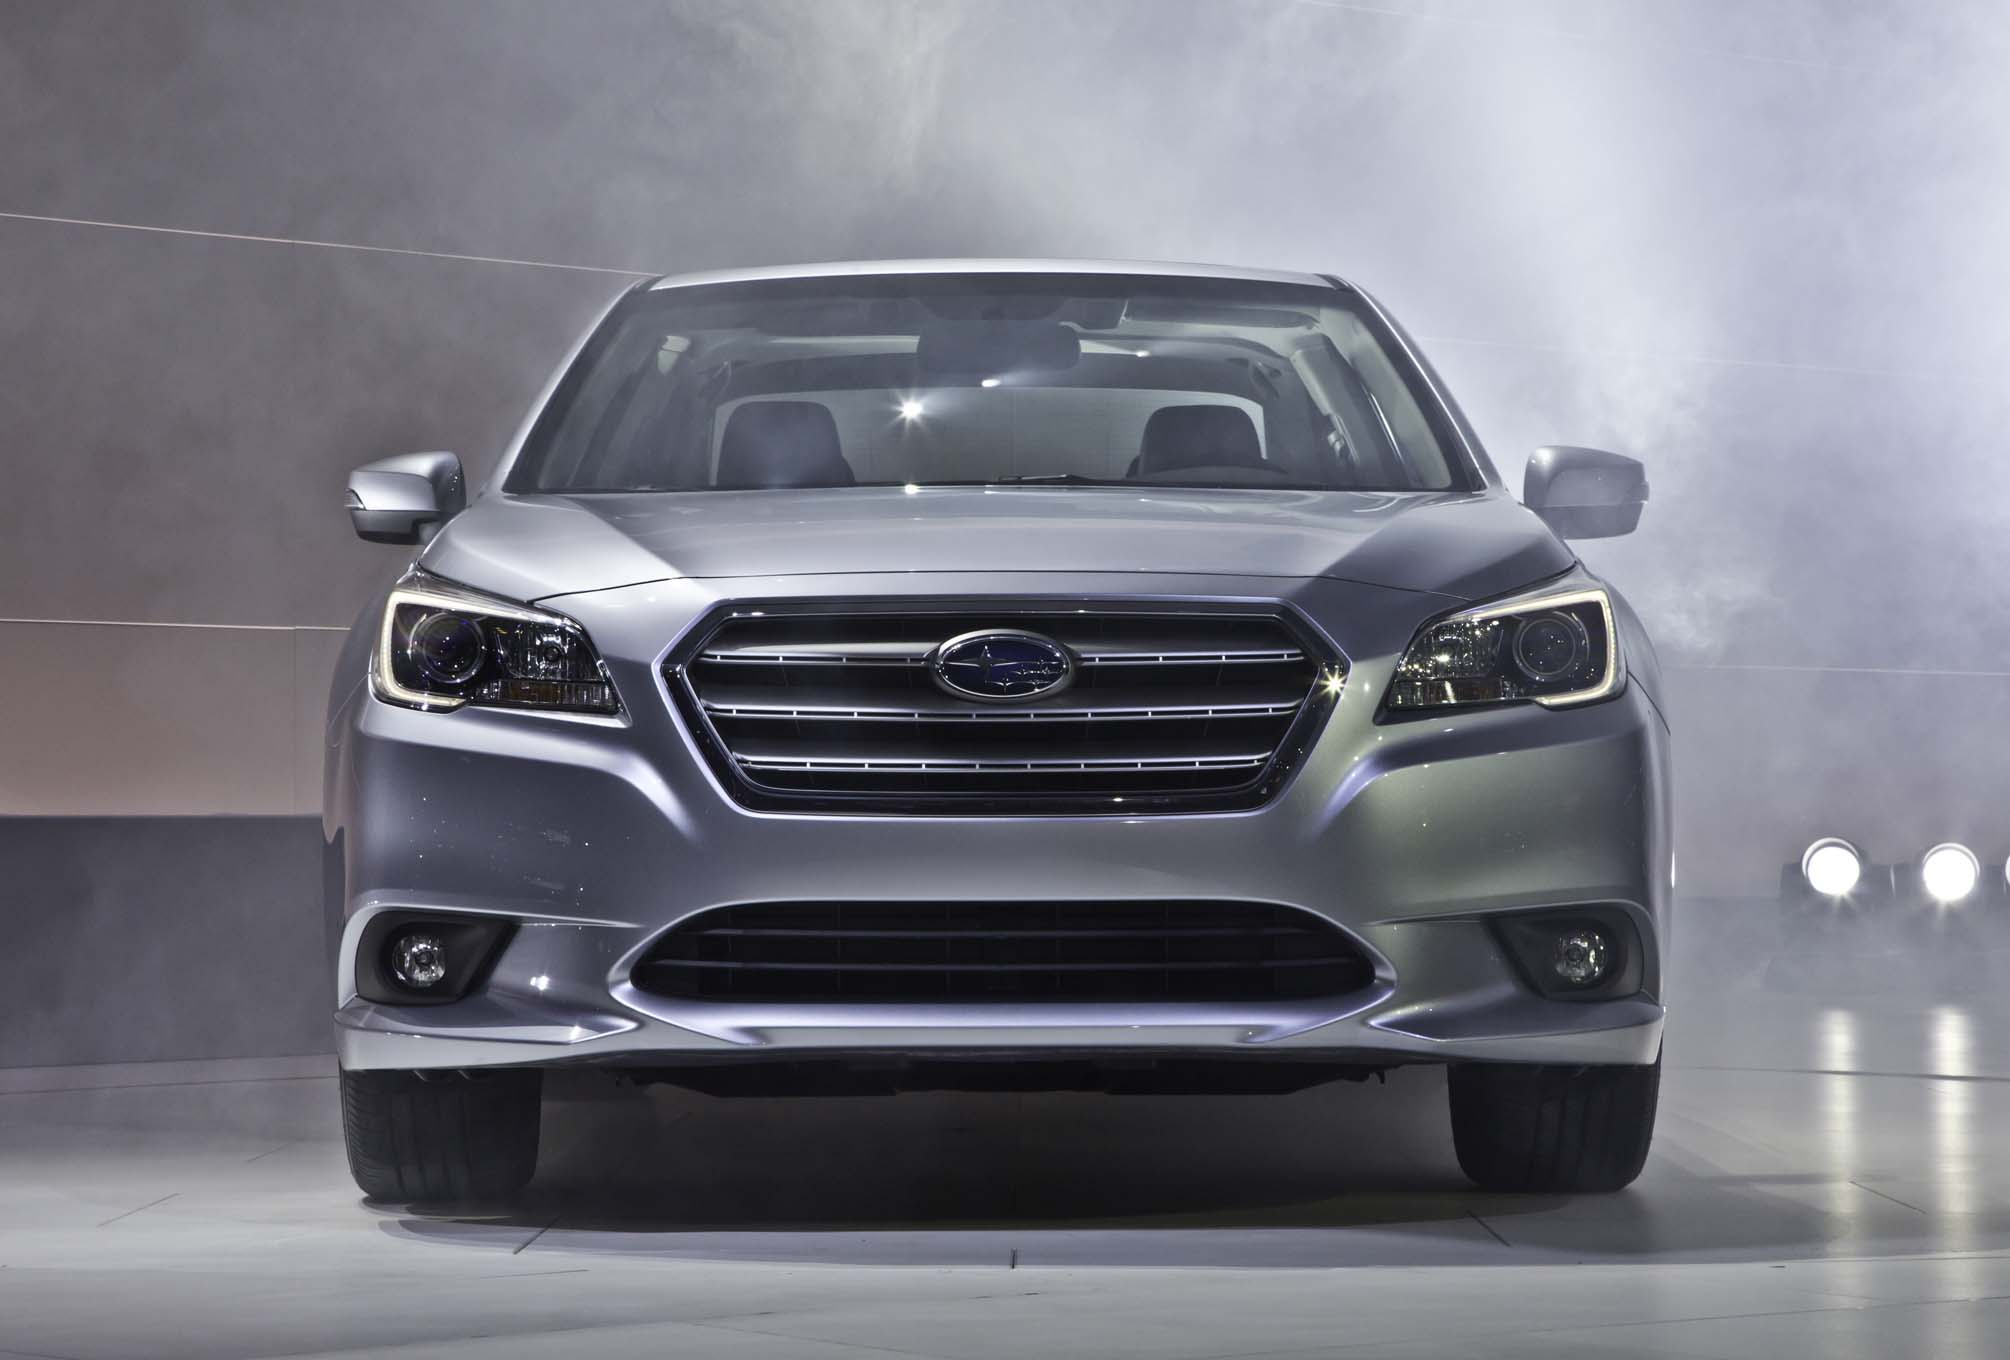 2015 Subaru Legacy Front Exterior